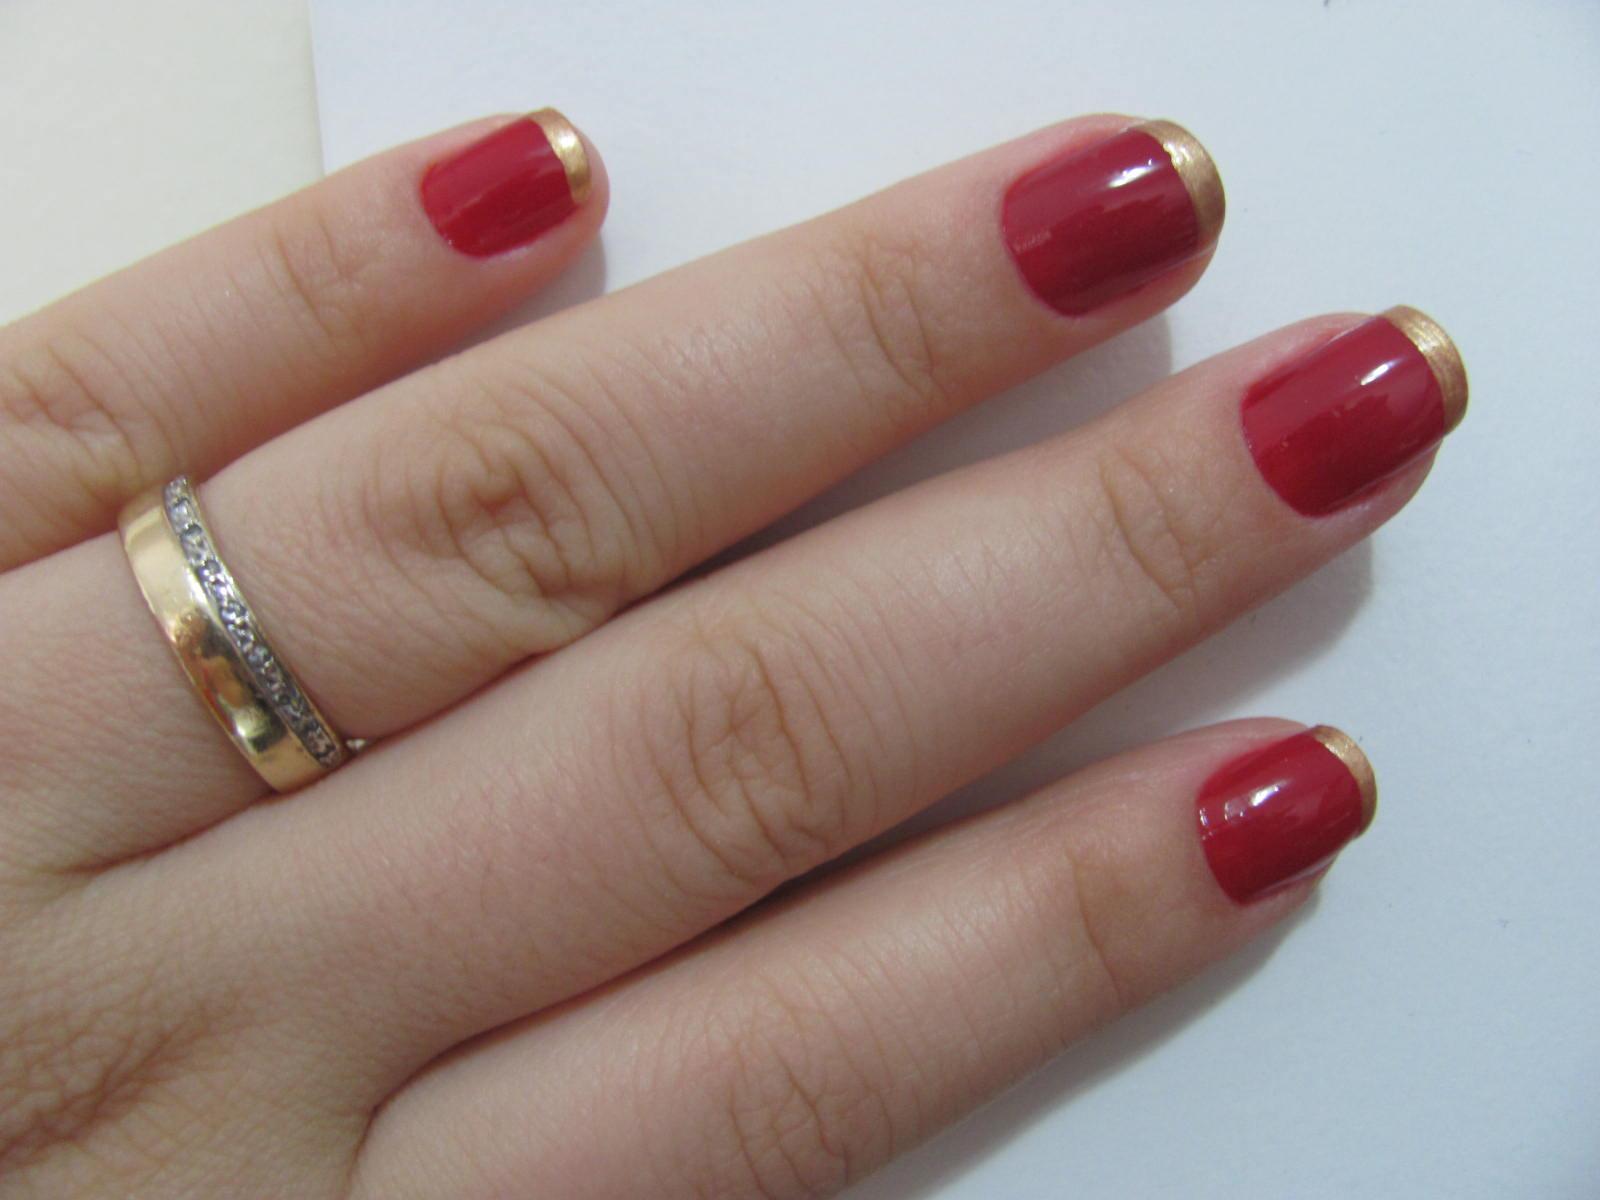 Suficiente Erika MakeUp: Esmalte da Semana: Francesinha Dourada!!! SW13